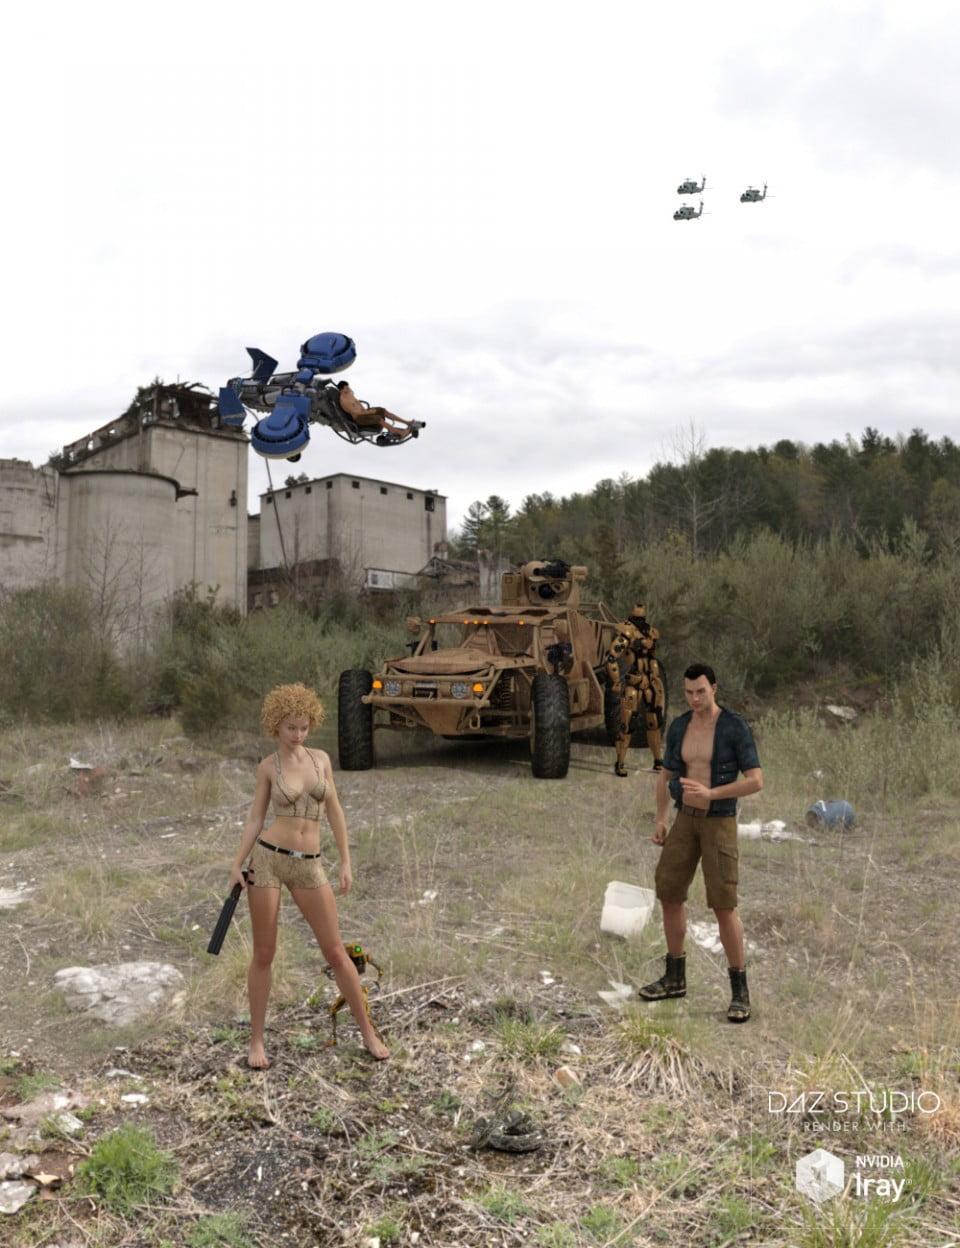 Iray HDRI: Apocalyptic Plant Outdoors Set 1